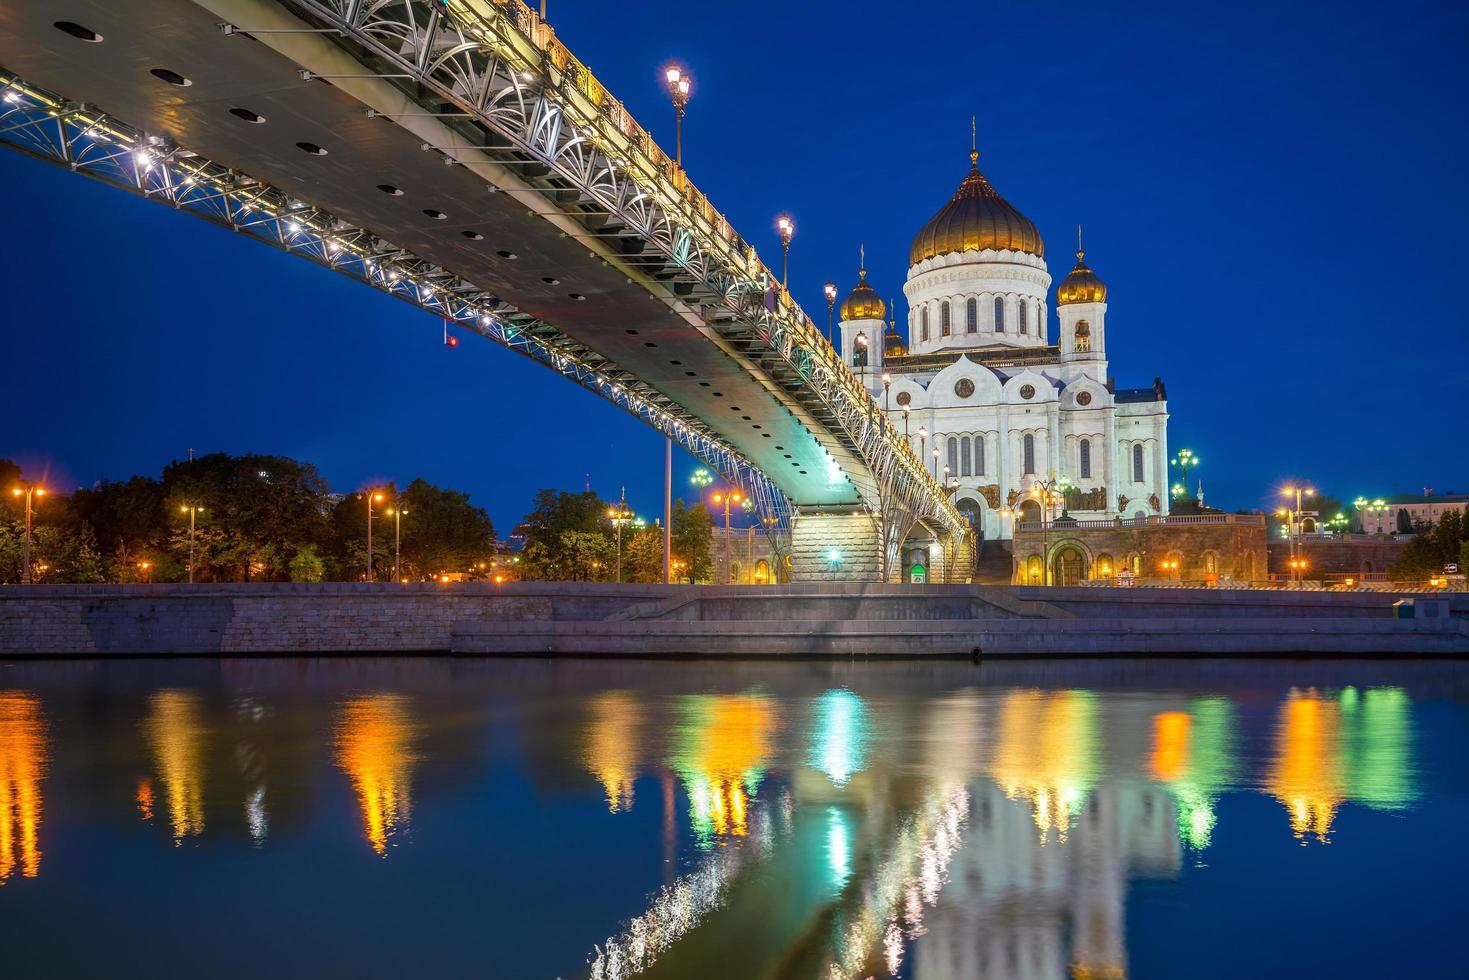 katedralen Kristus Frälsaren i Moskva foto